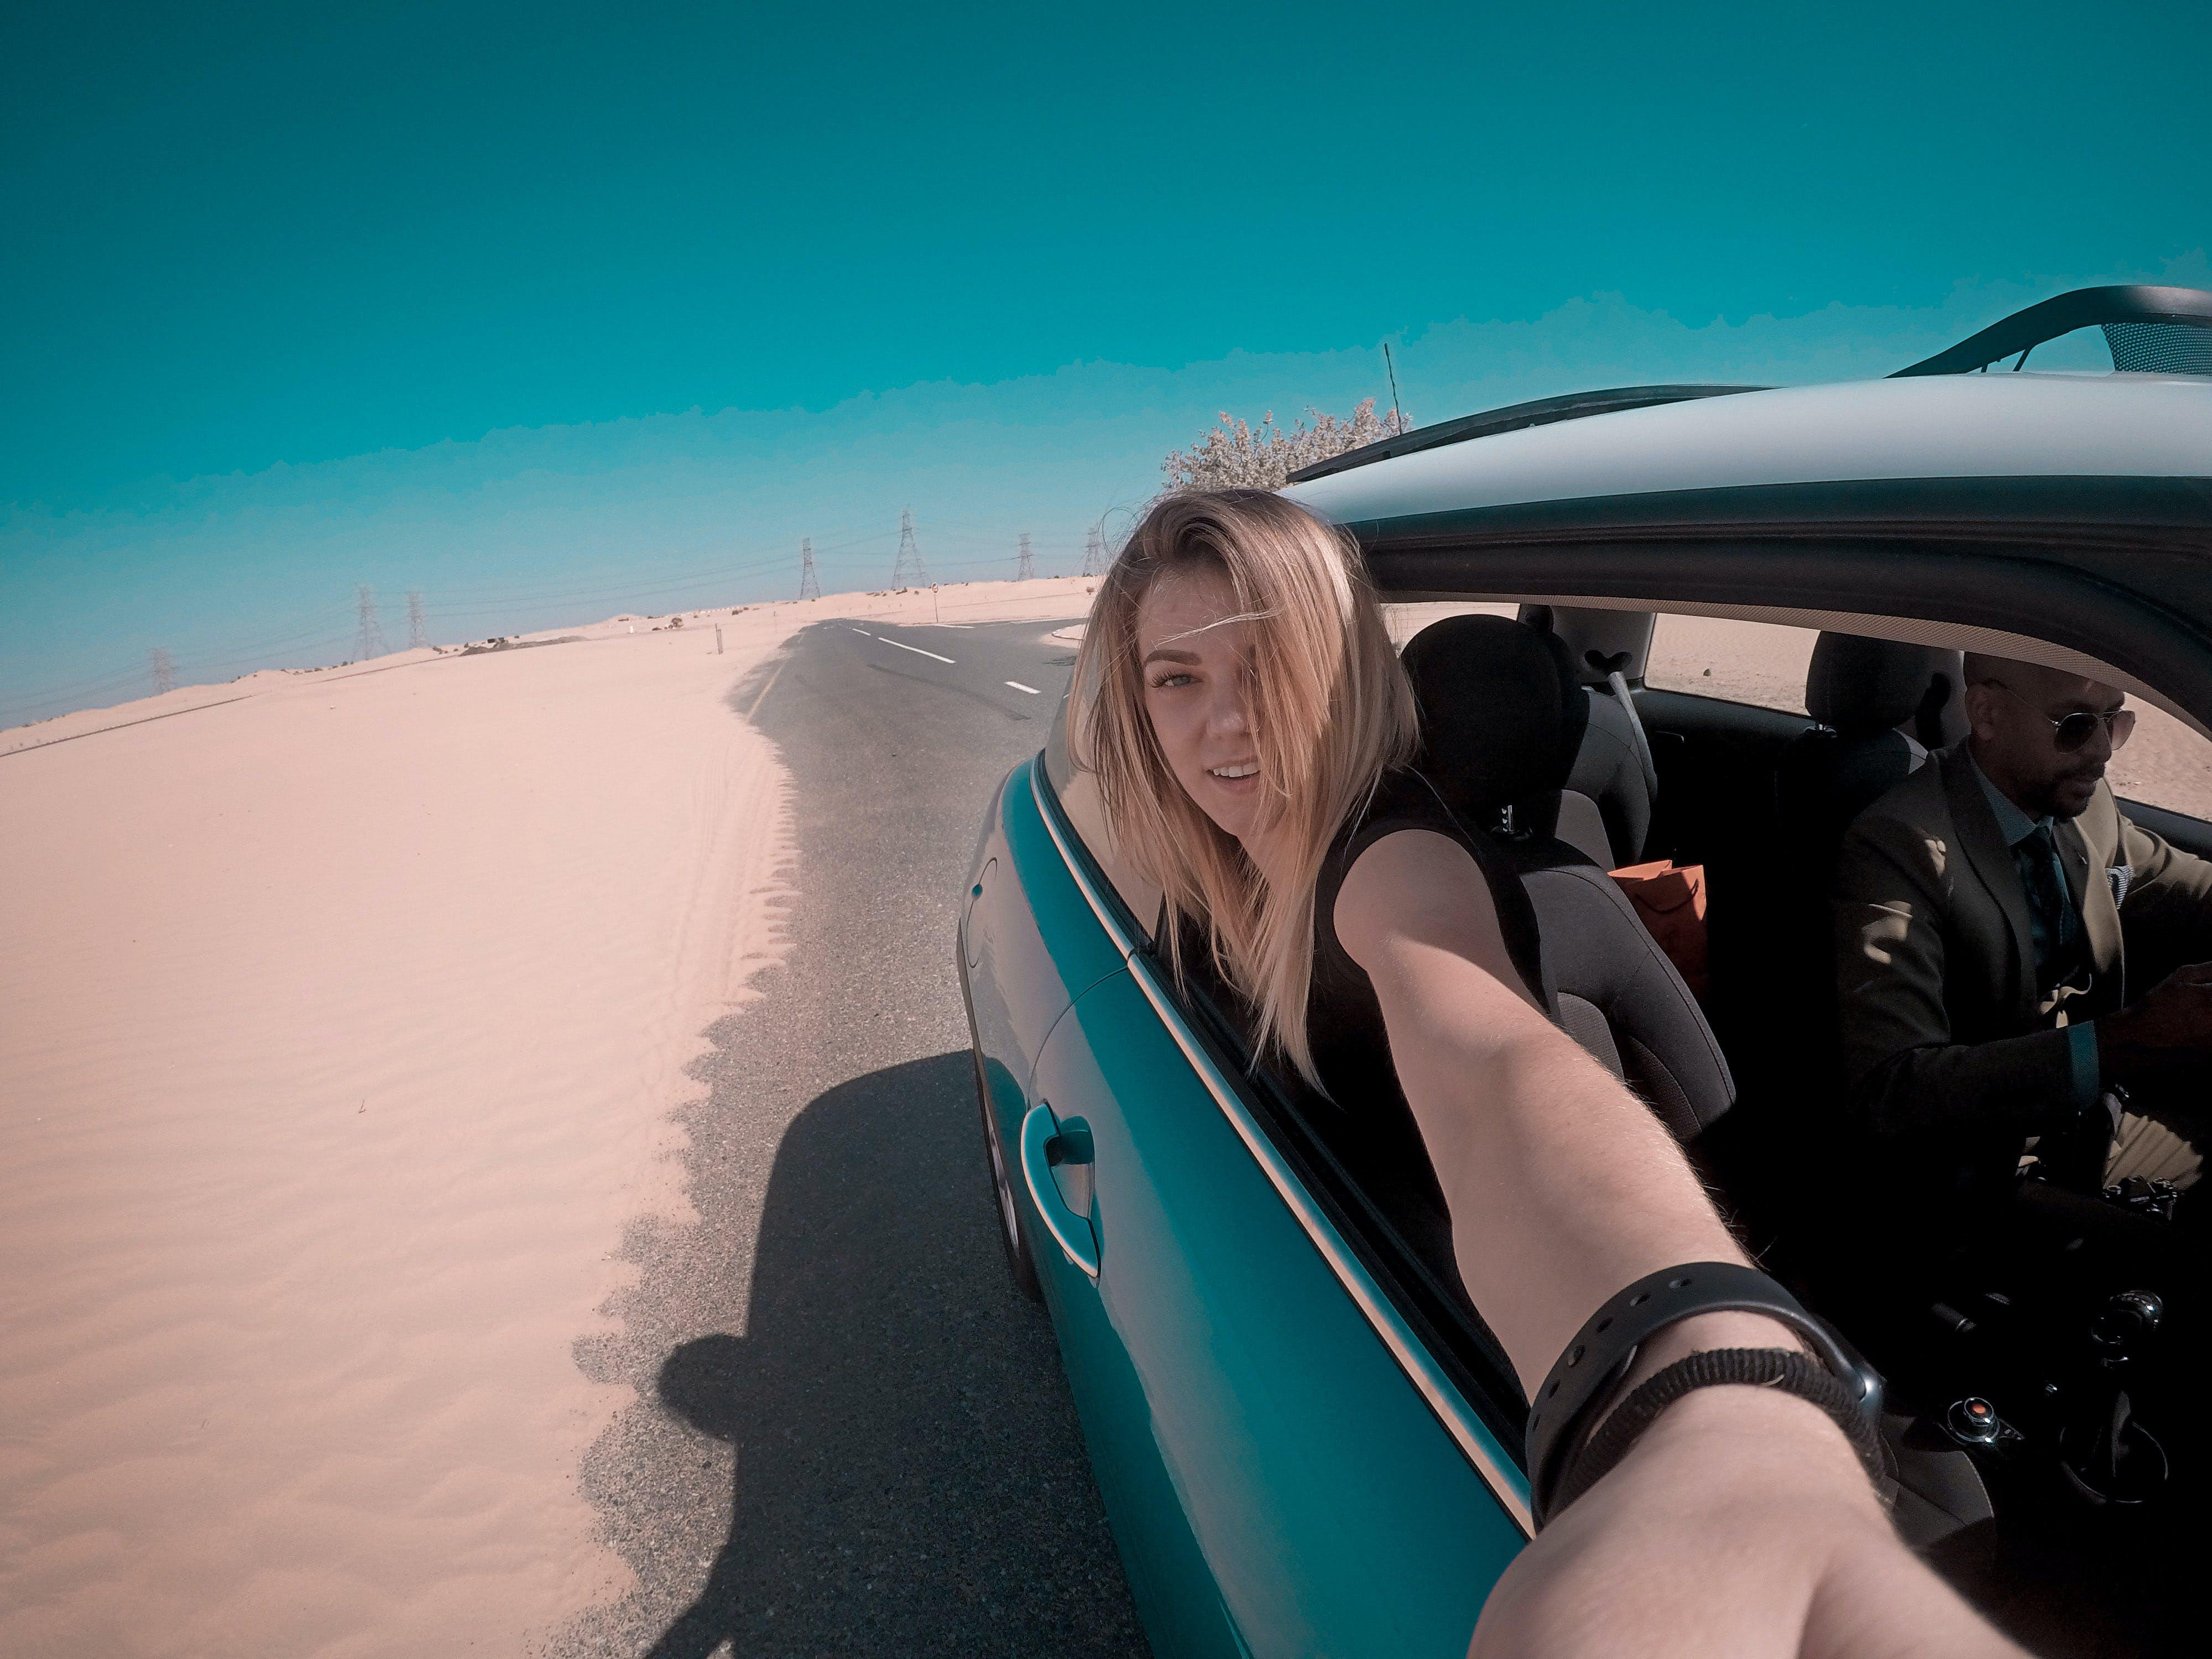 Free stock photo of road, car, selfie, gopro